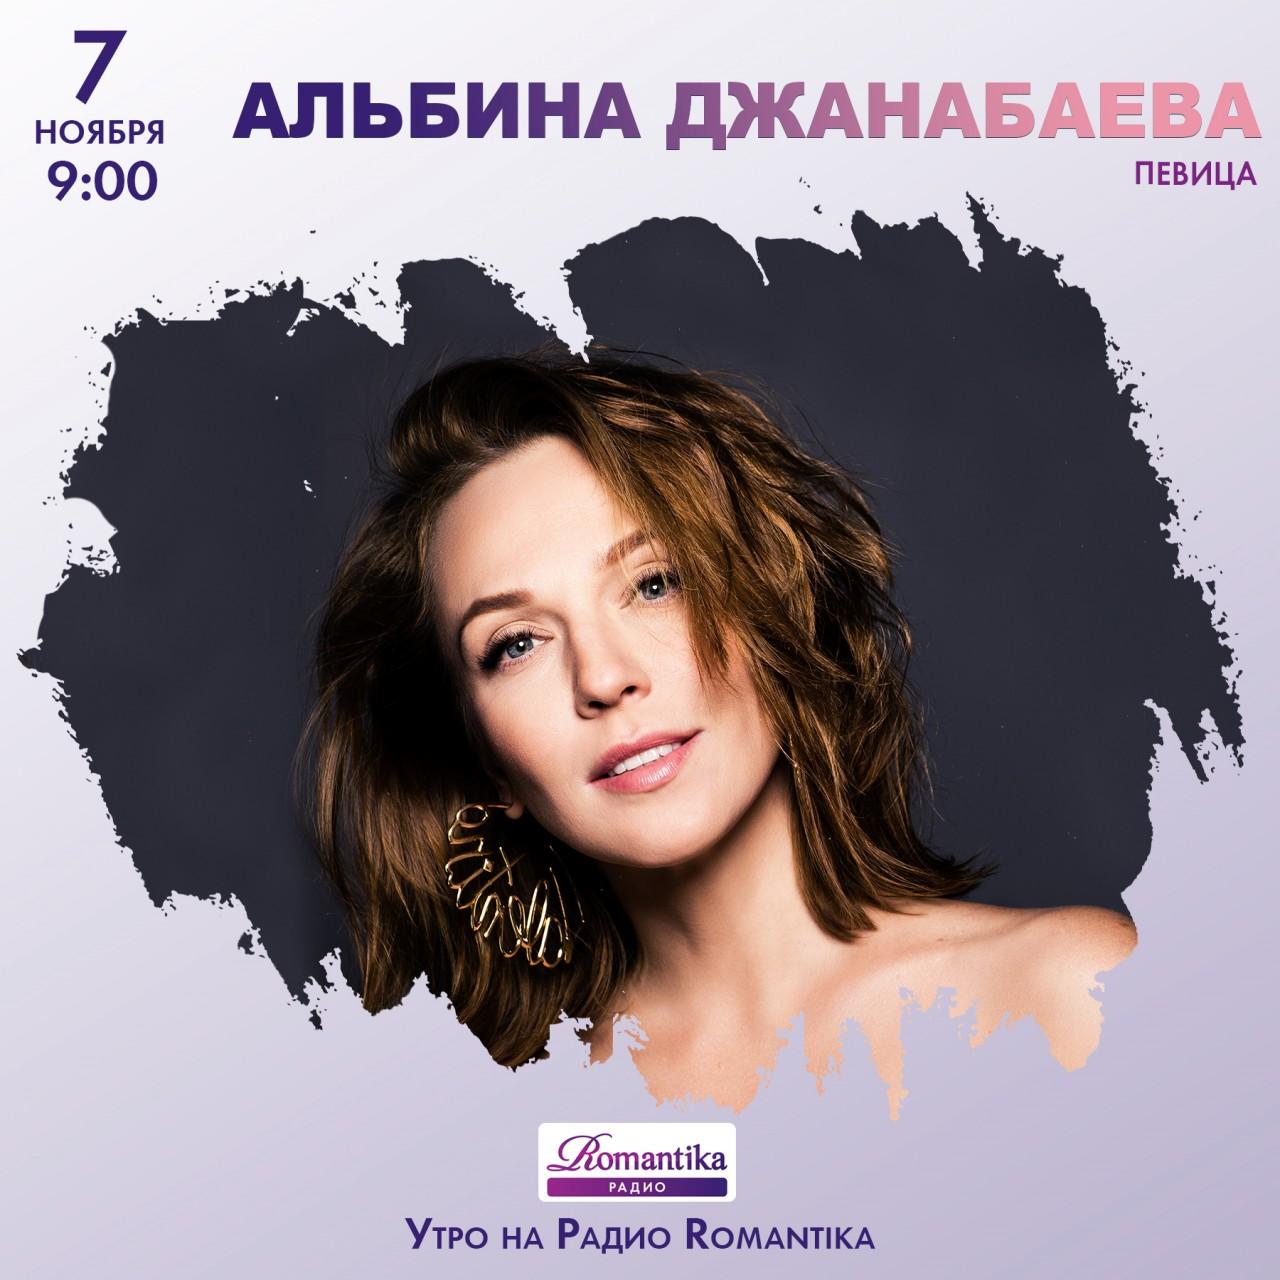 Радио Romantika: 7 ноября - …